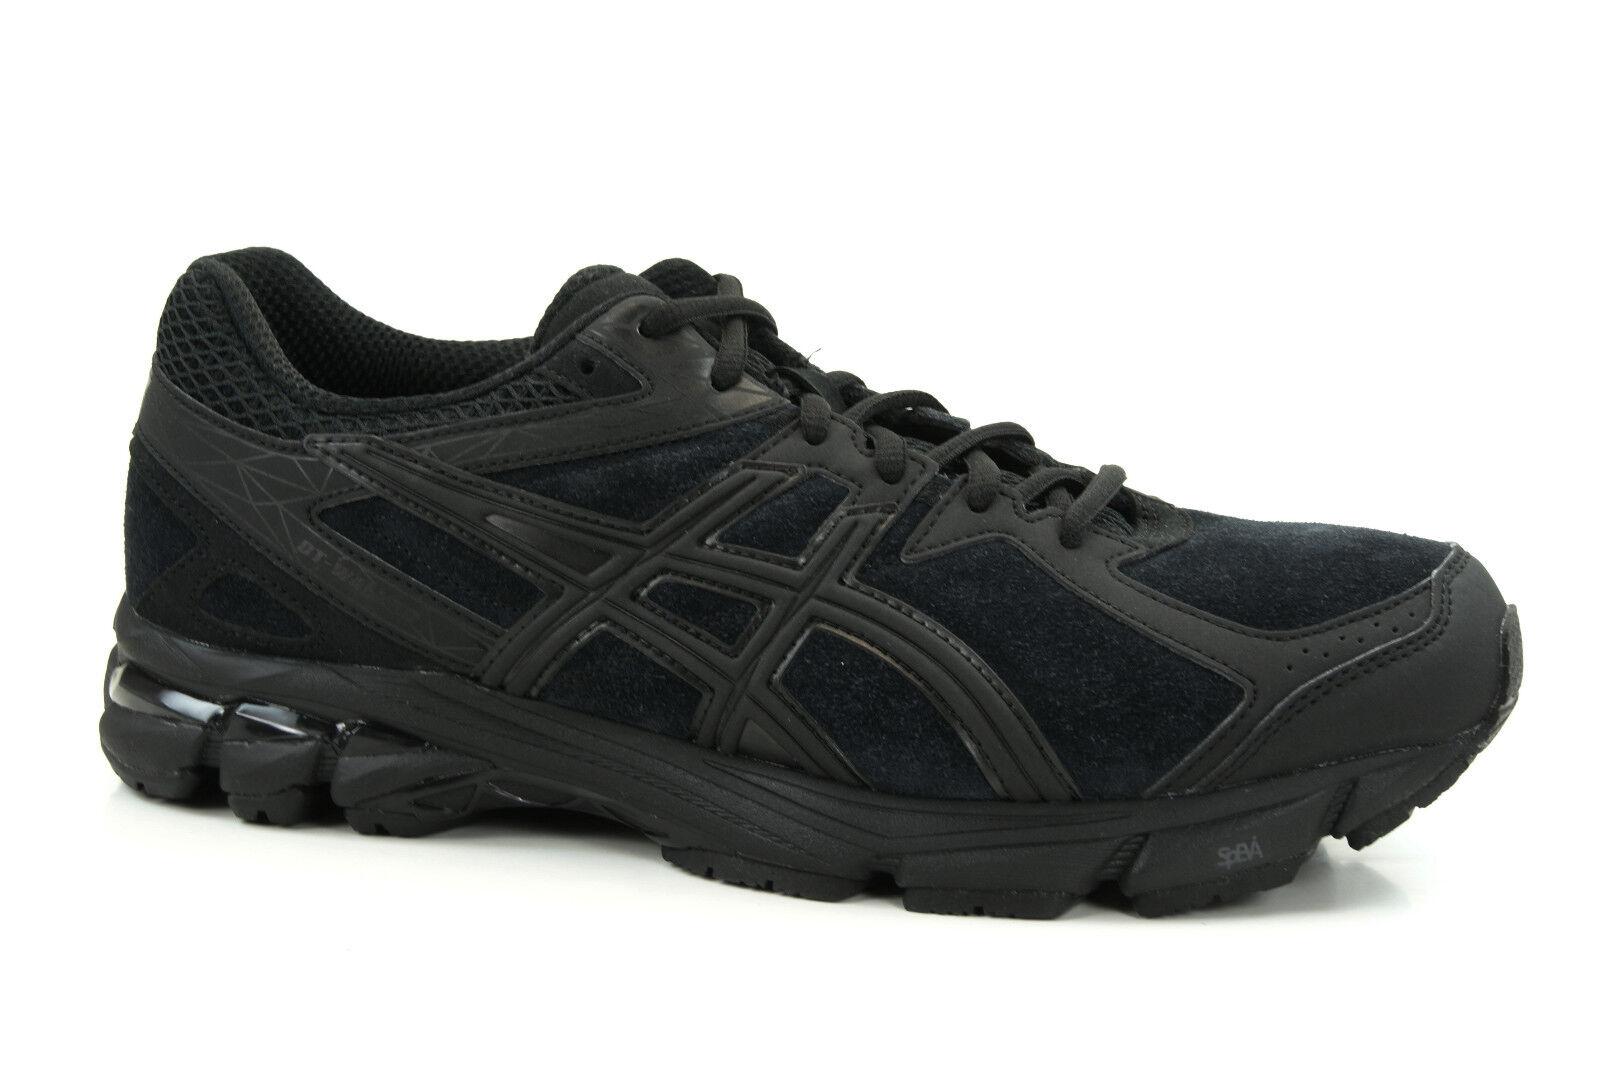 Asics Gel Gt-Zapatos para Caminar Walker al aire libre para Hombre Senderismo Q50NK-9090